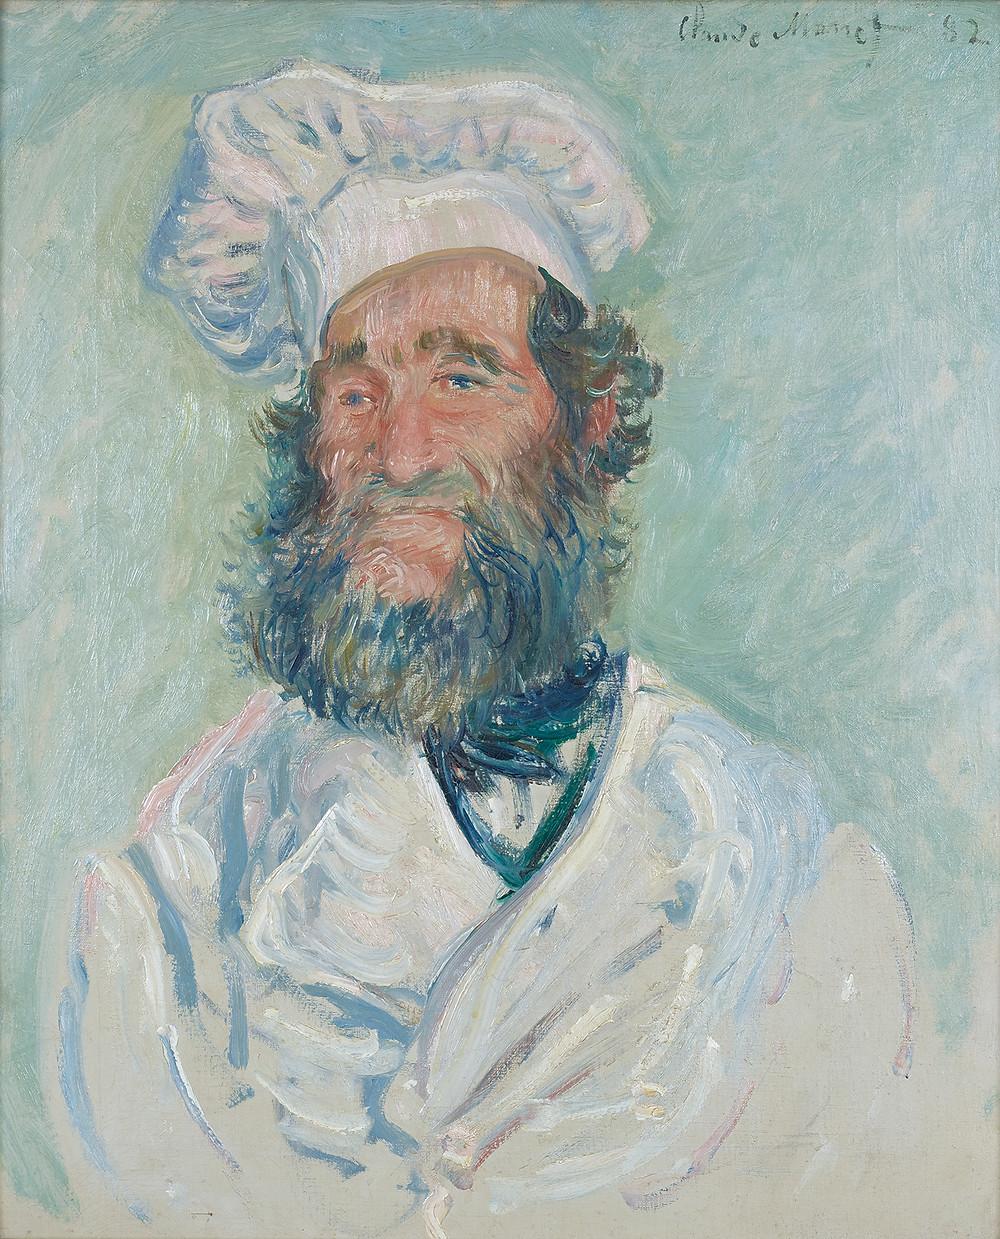 Claude Monet, The Chef, 1882